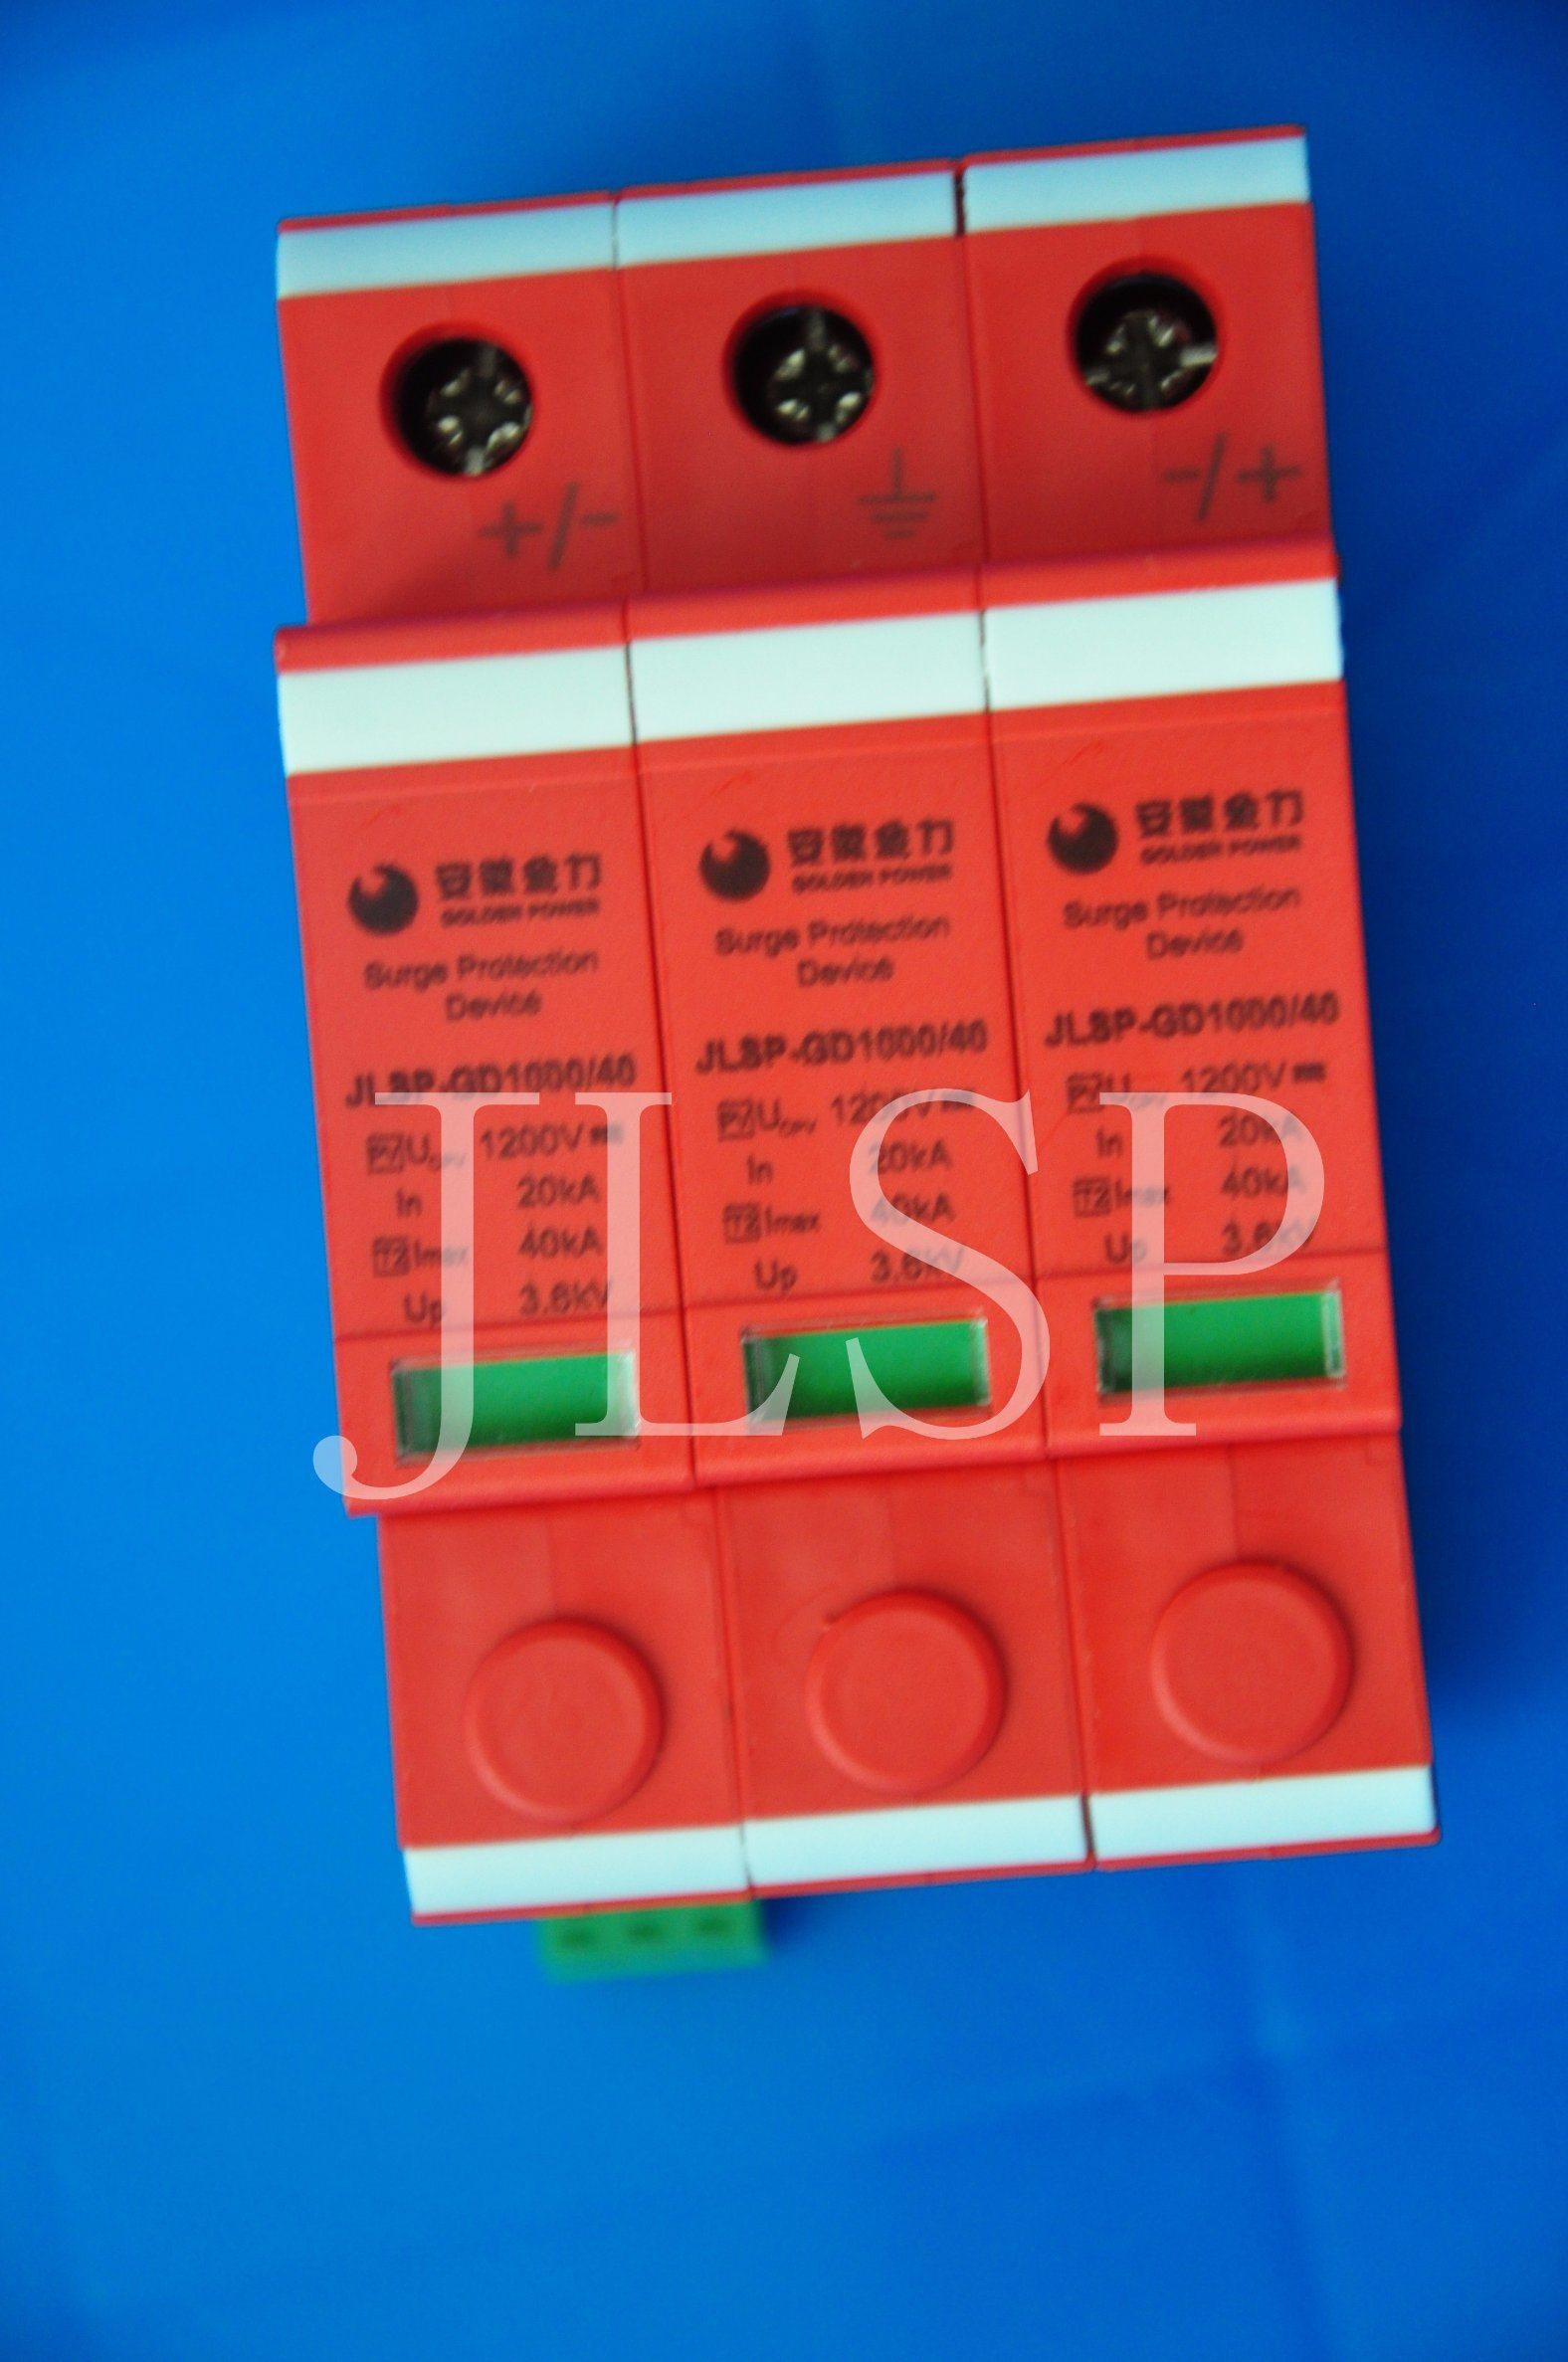 PV Application Solar 3p SPD/Surge Protector (GA754-27)